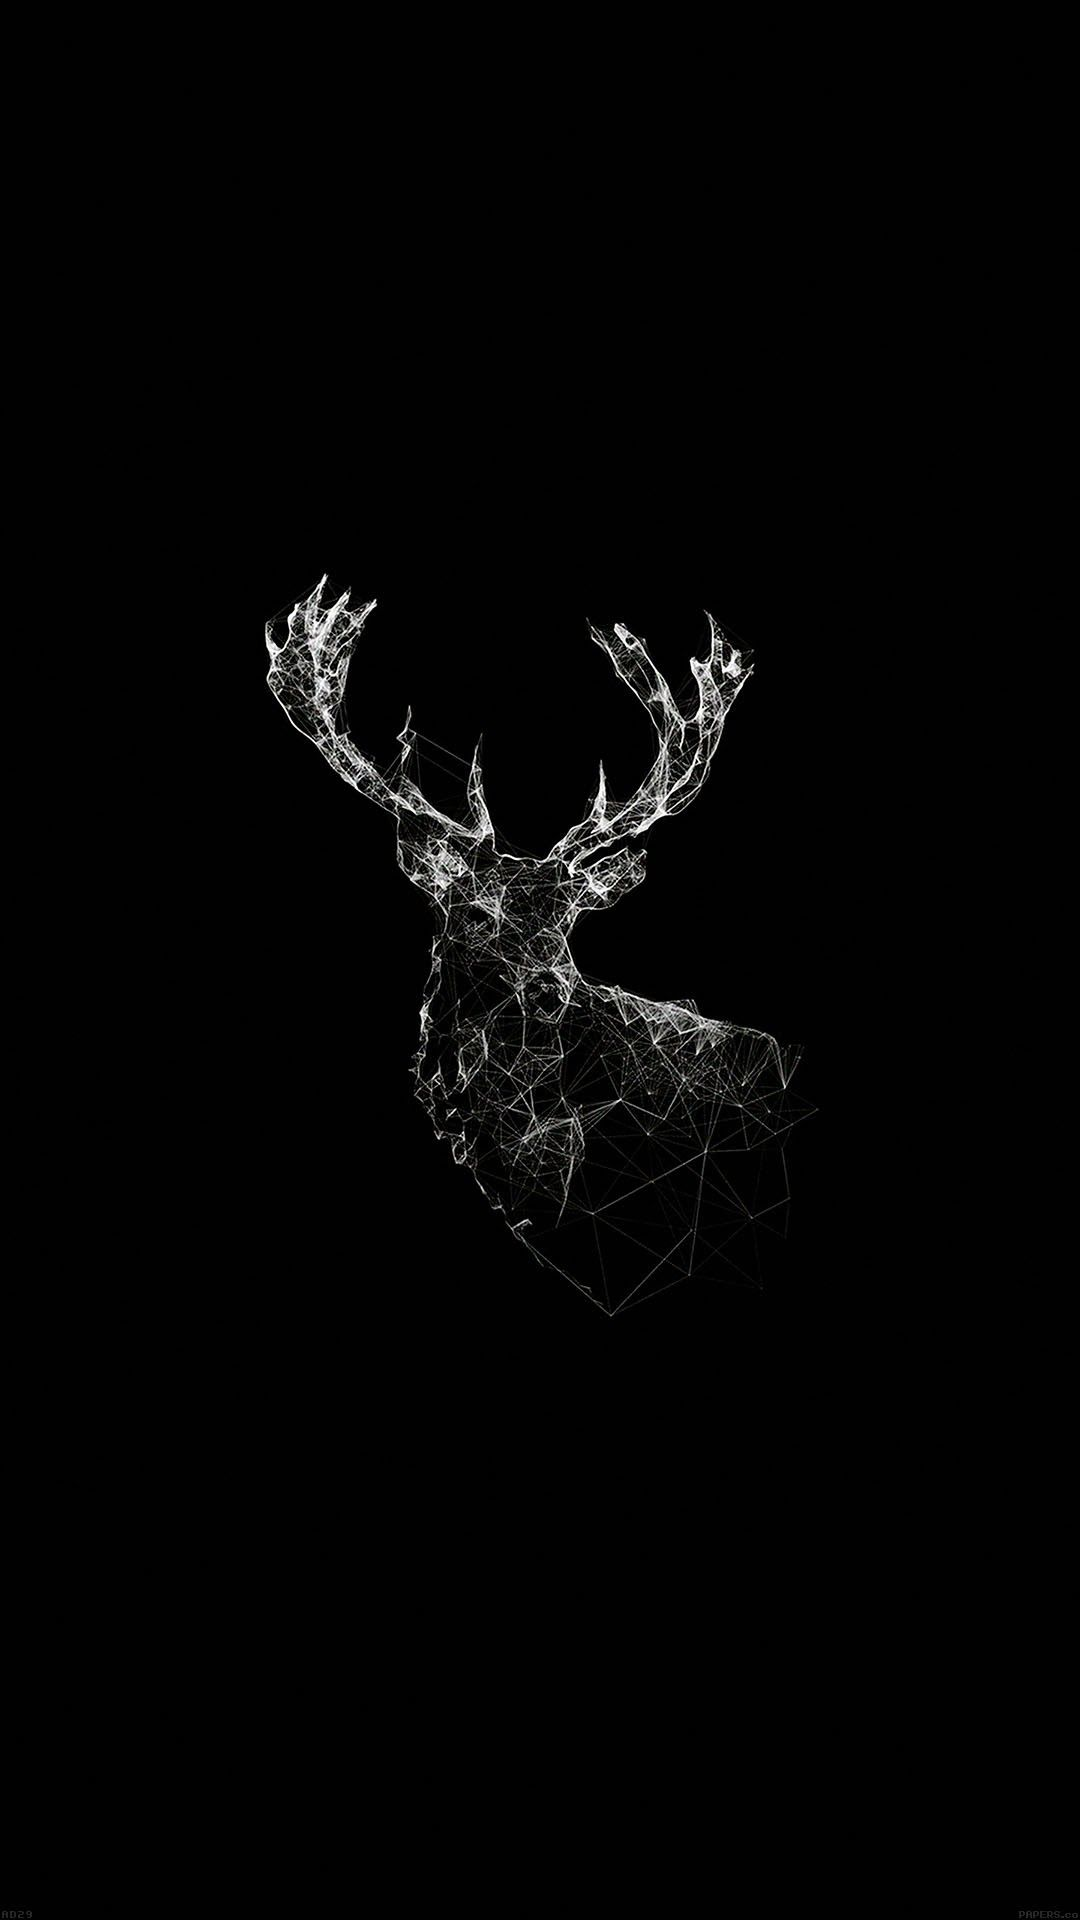 22+ Cool deer wallpaper 4k UHD